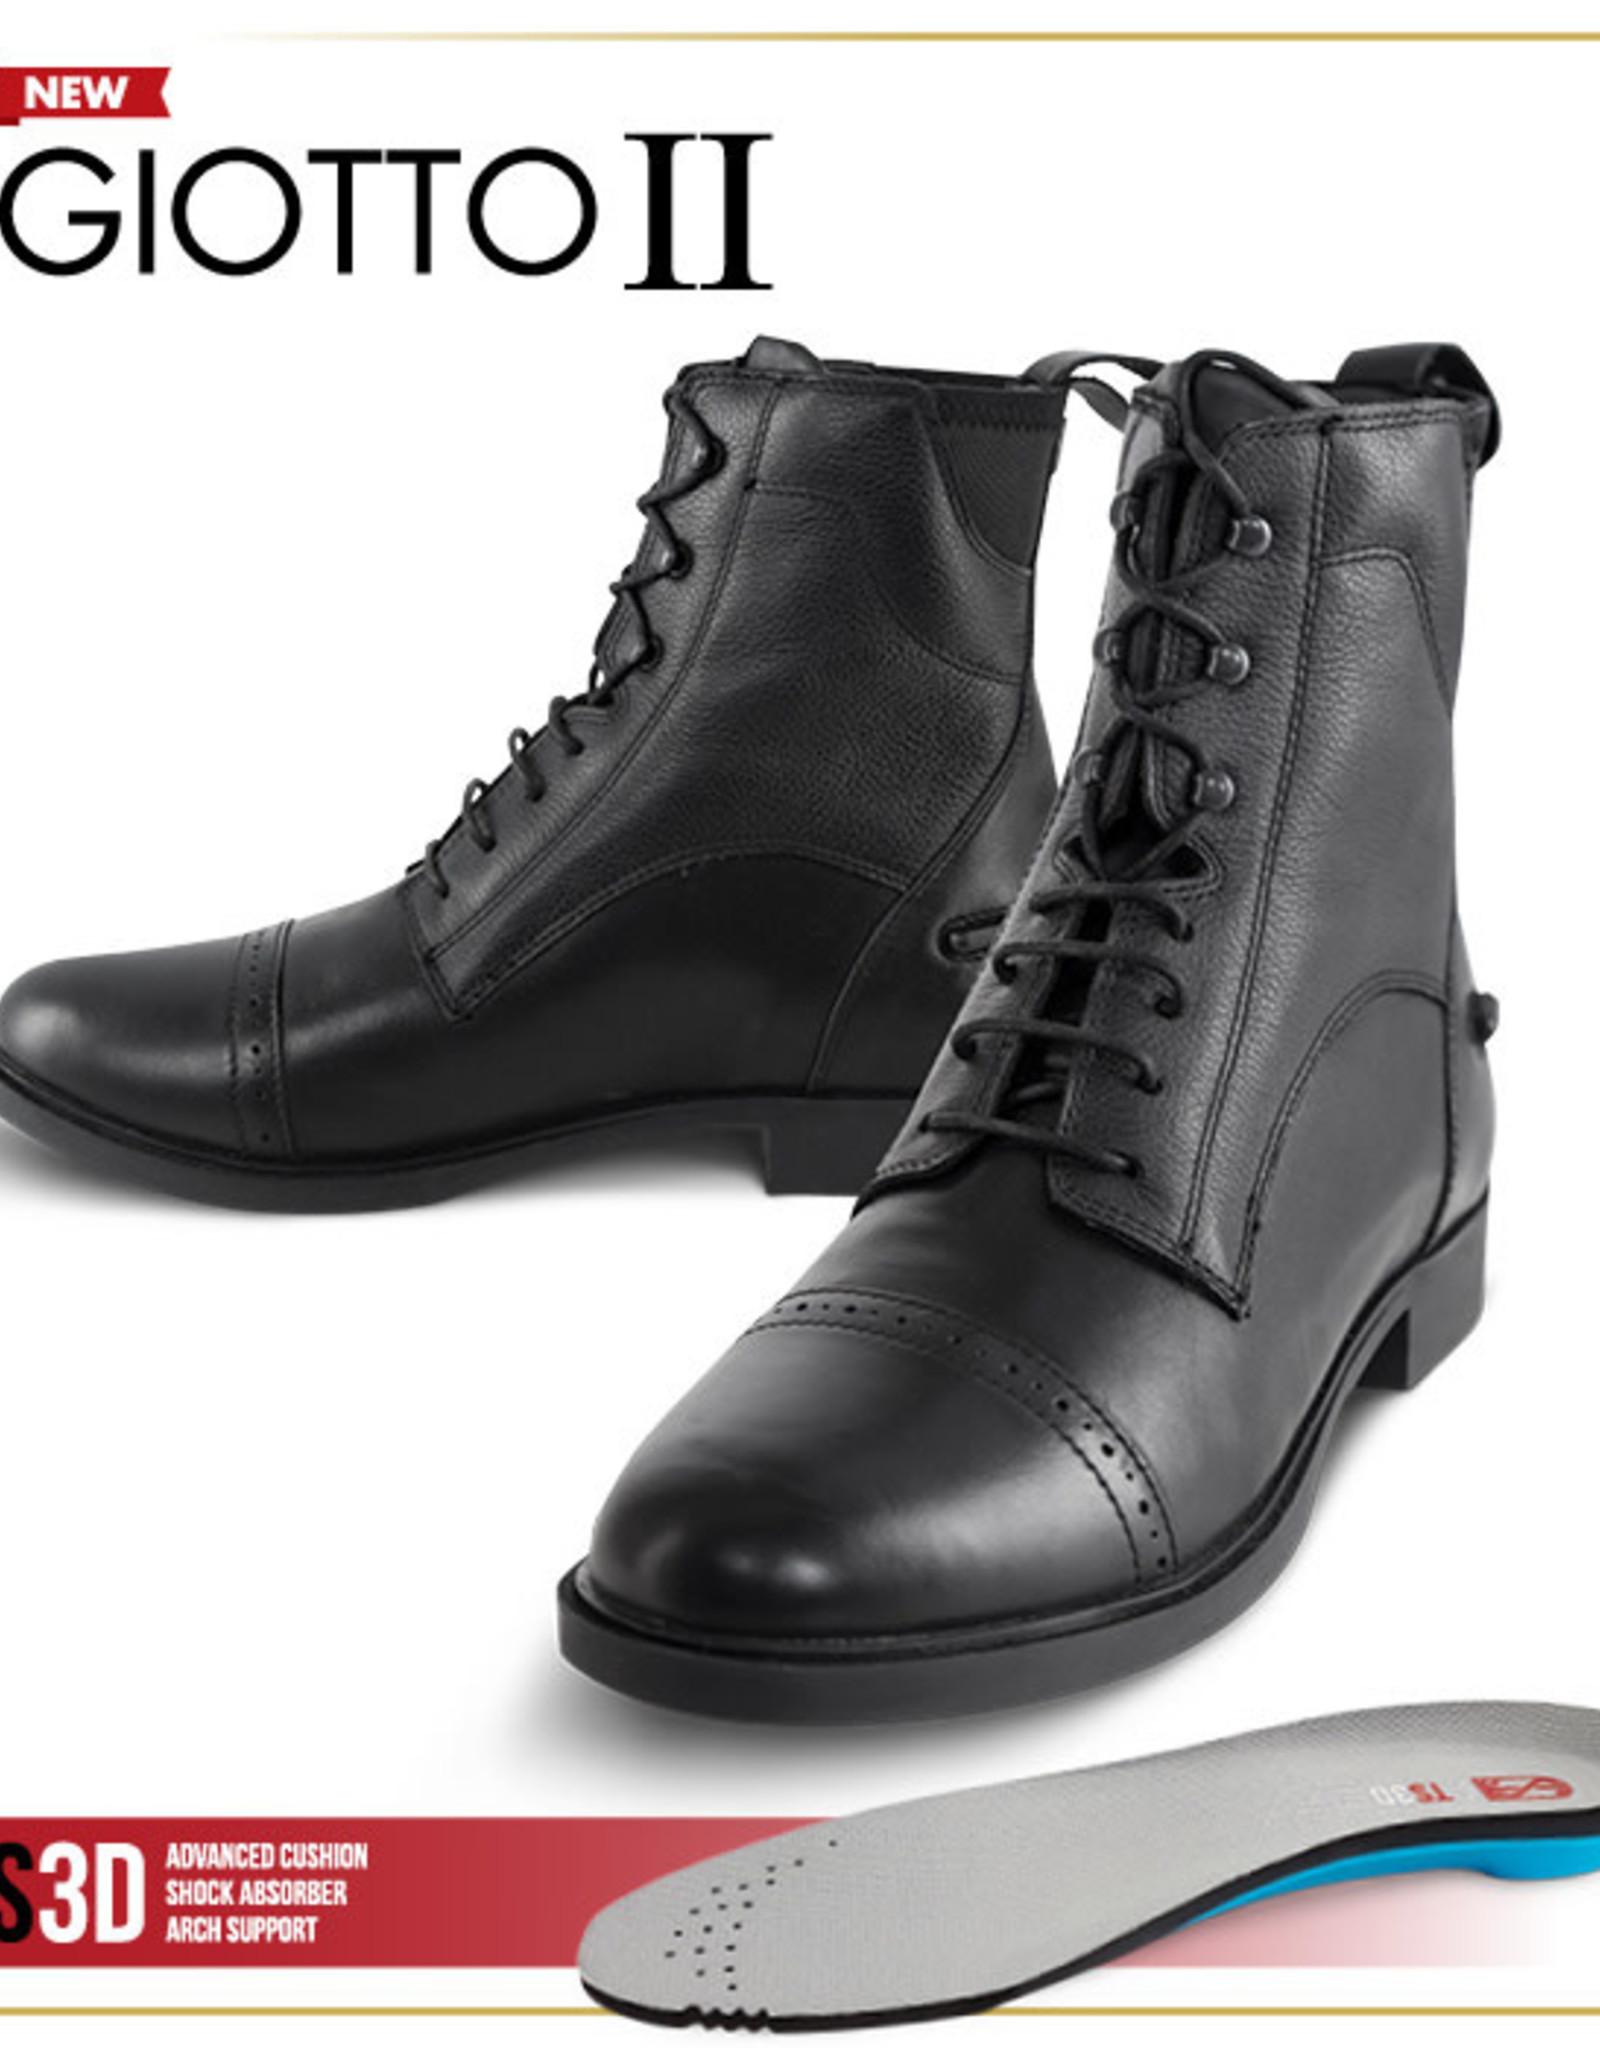 Tredstep Giotto Paddock Boot